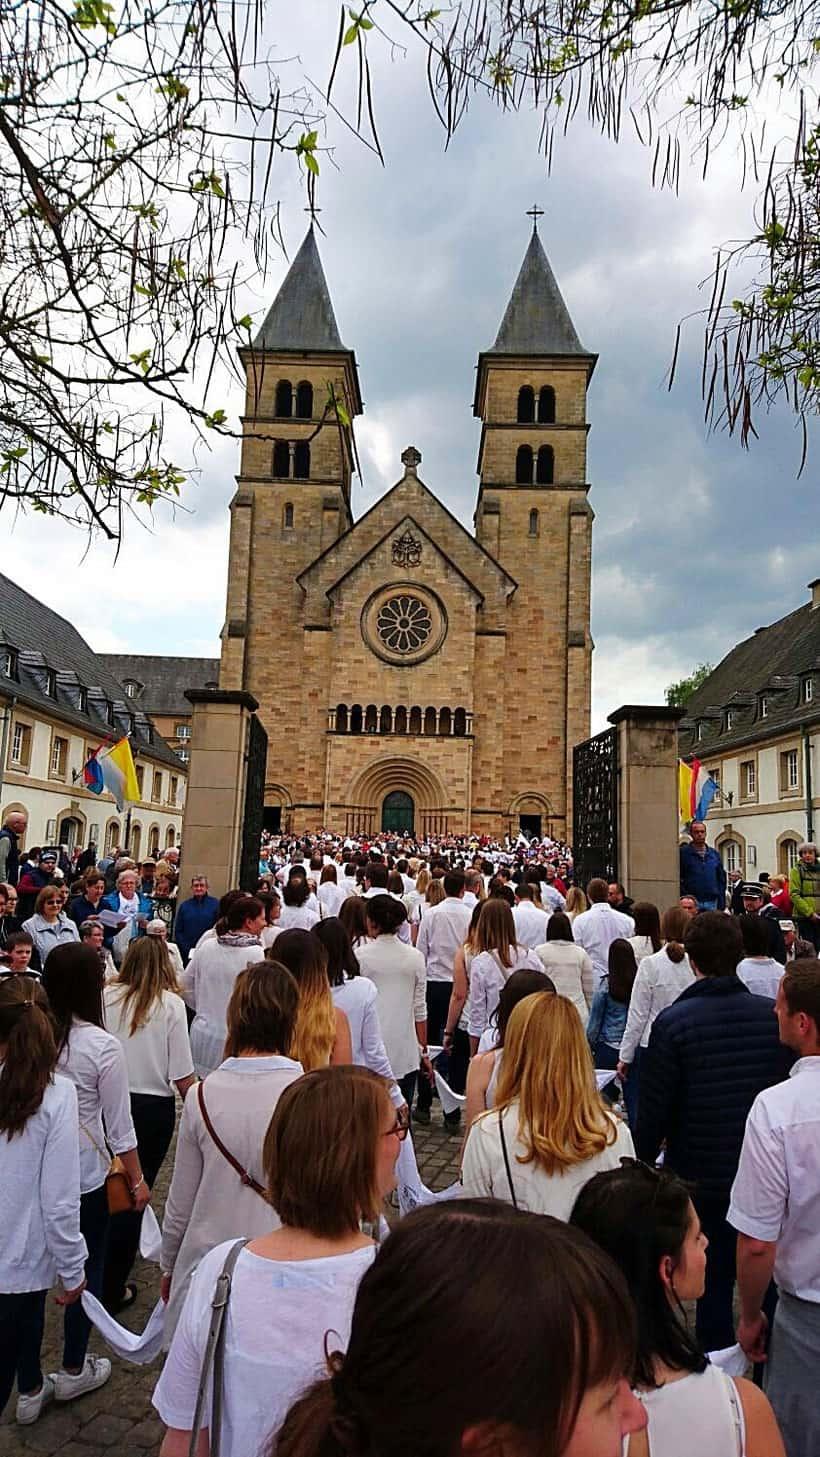 Luxembourg, luxemburgo, turismo, tourism, echternach, visit, que hacer, restaurants, willibrord, dancing procession, denzelt, medieval, maket place, culture, hiking, nature, naturaleza, senderismo, grave, shrine, saint, pilgrimage